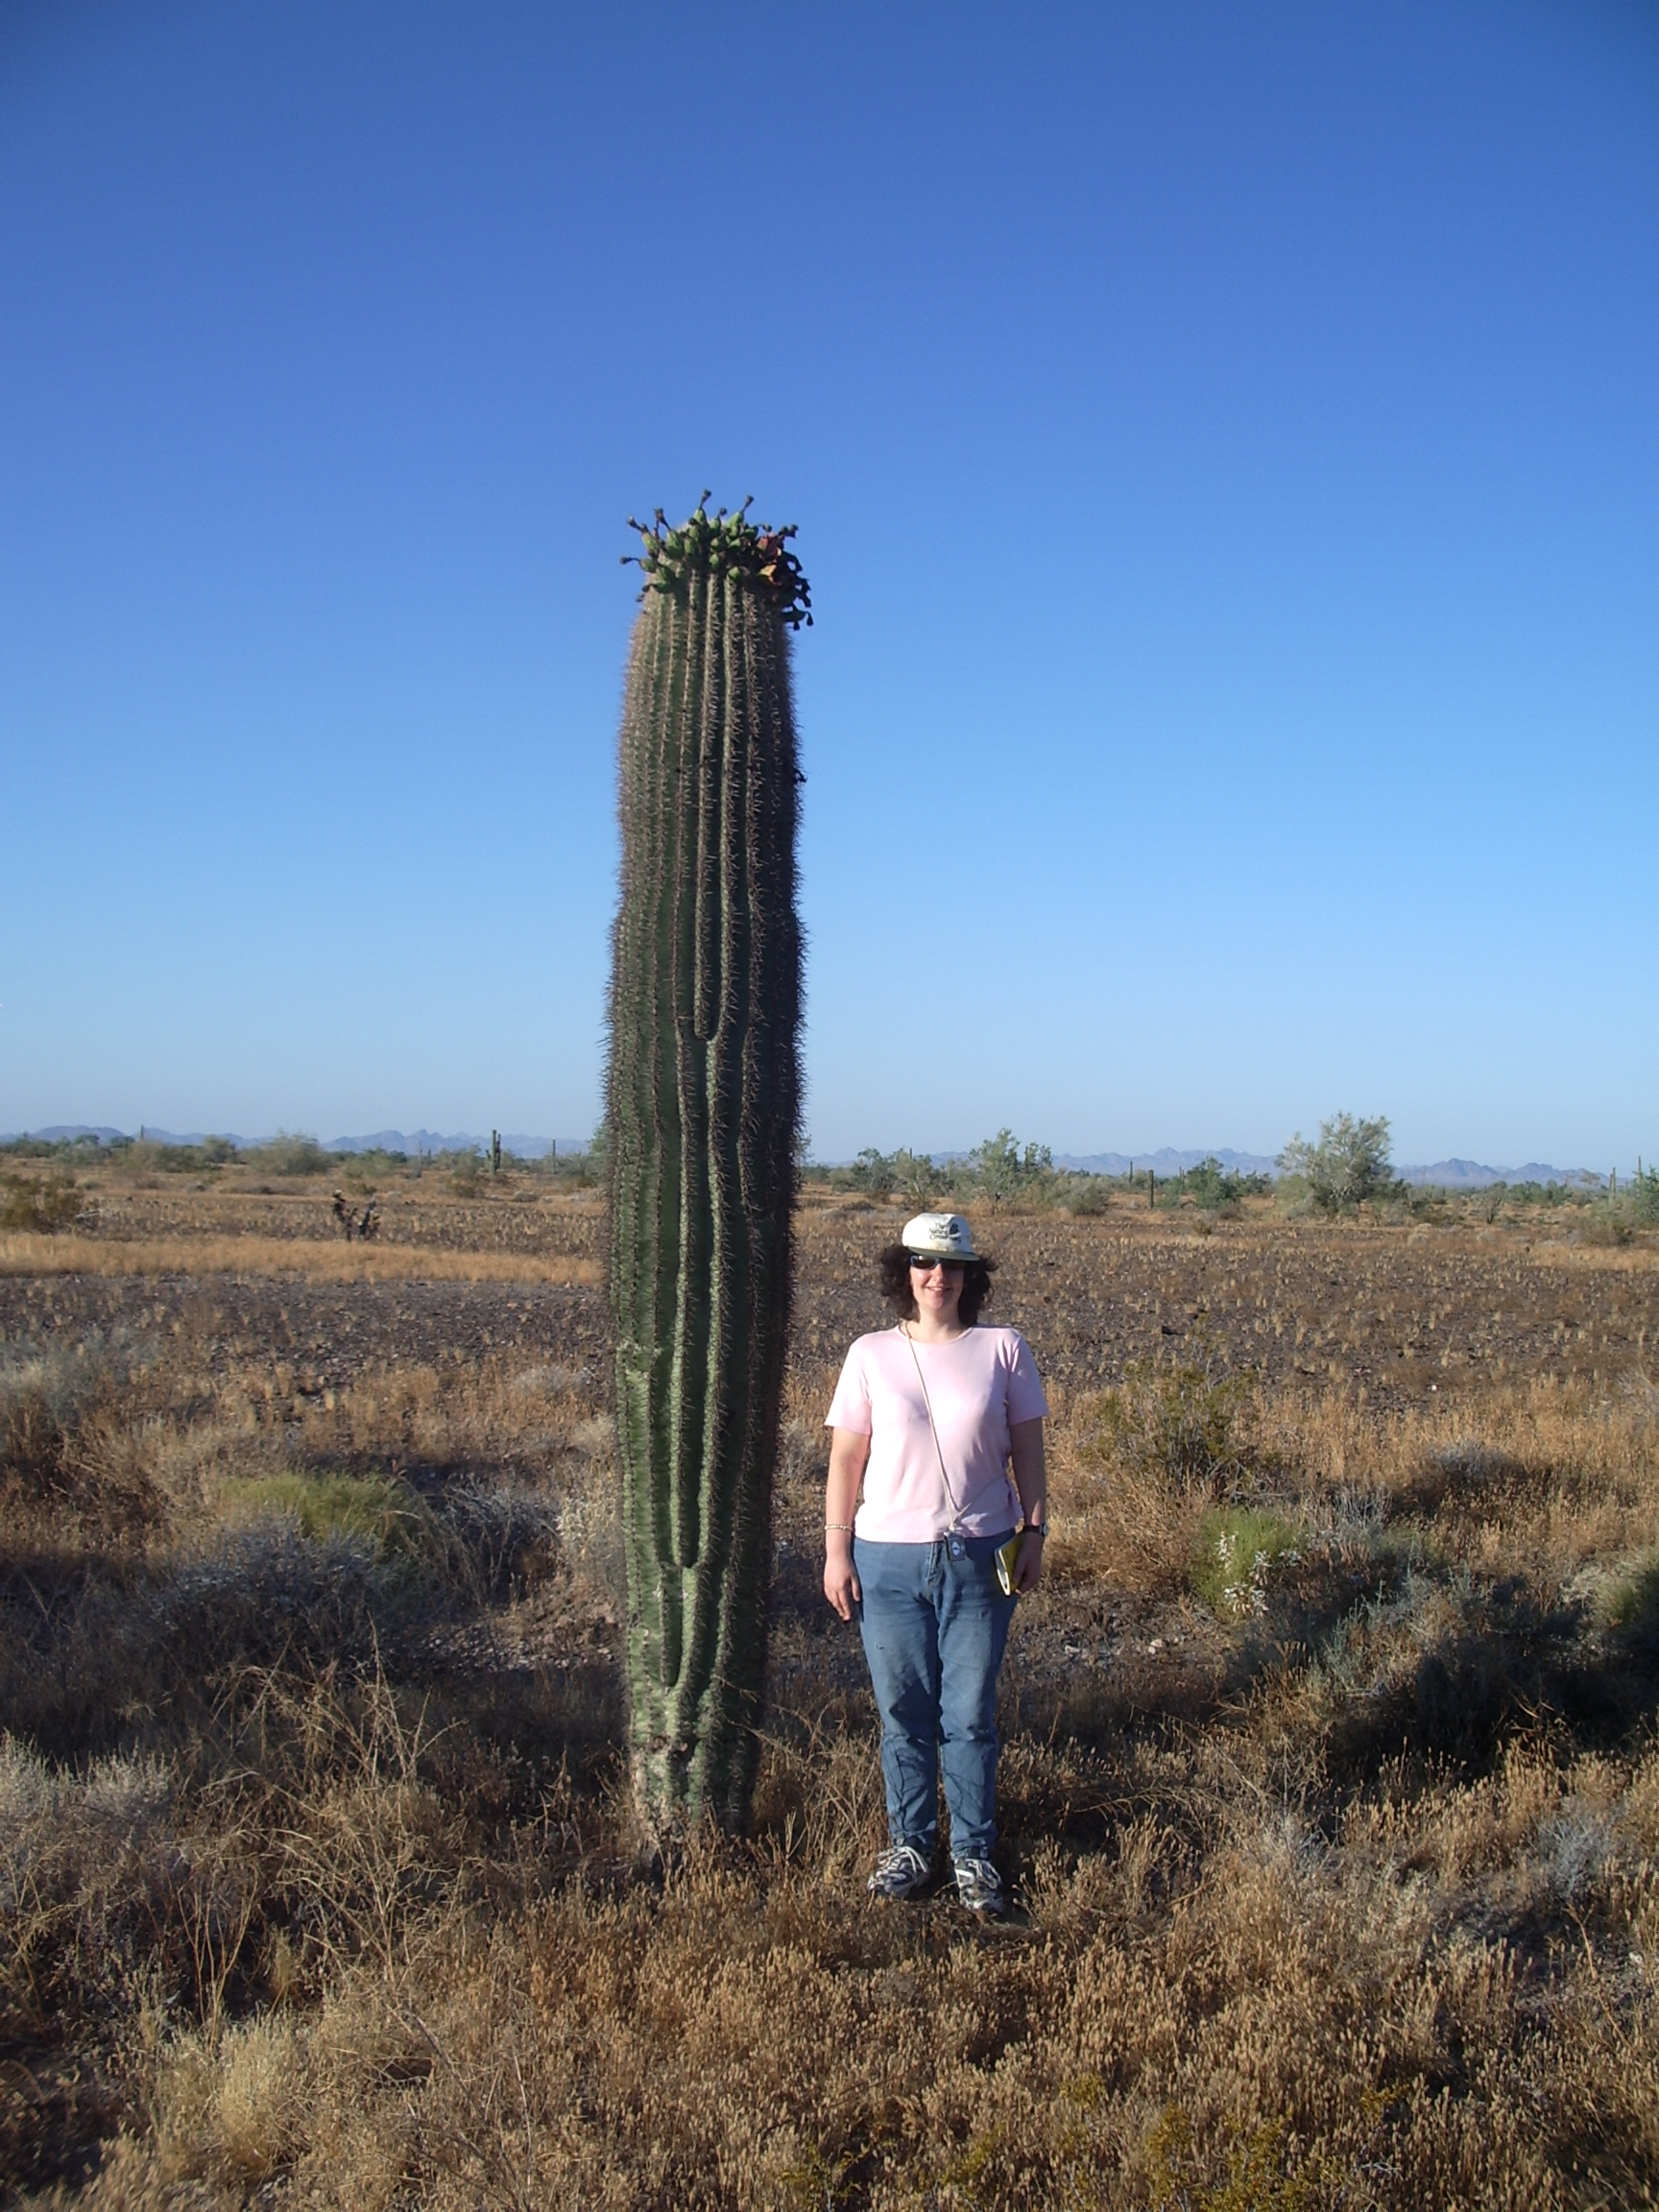 Distant Volcanic Eruptions Foster Saguaro Cacti Baby Booms